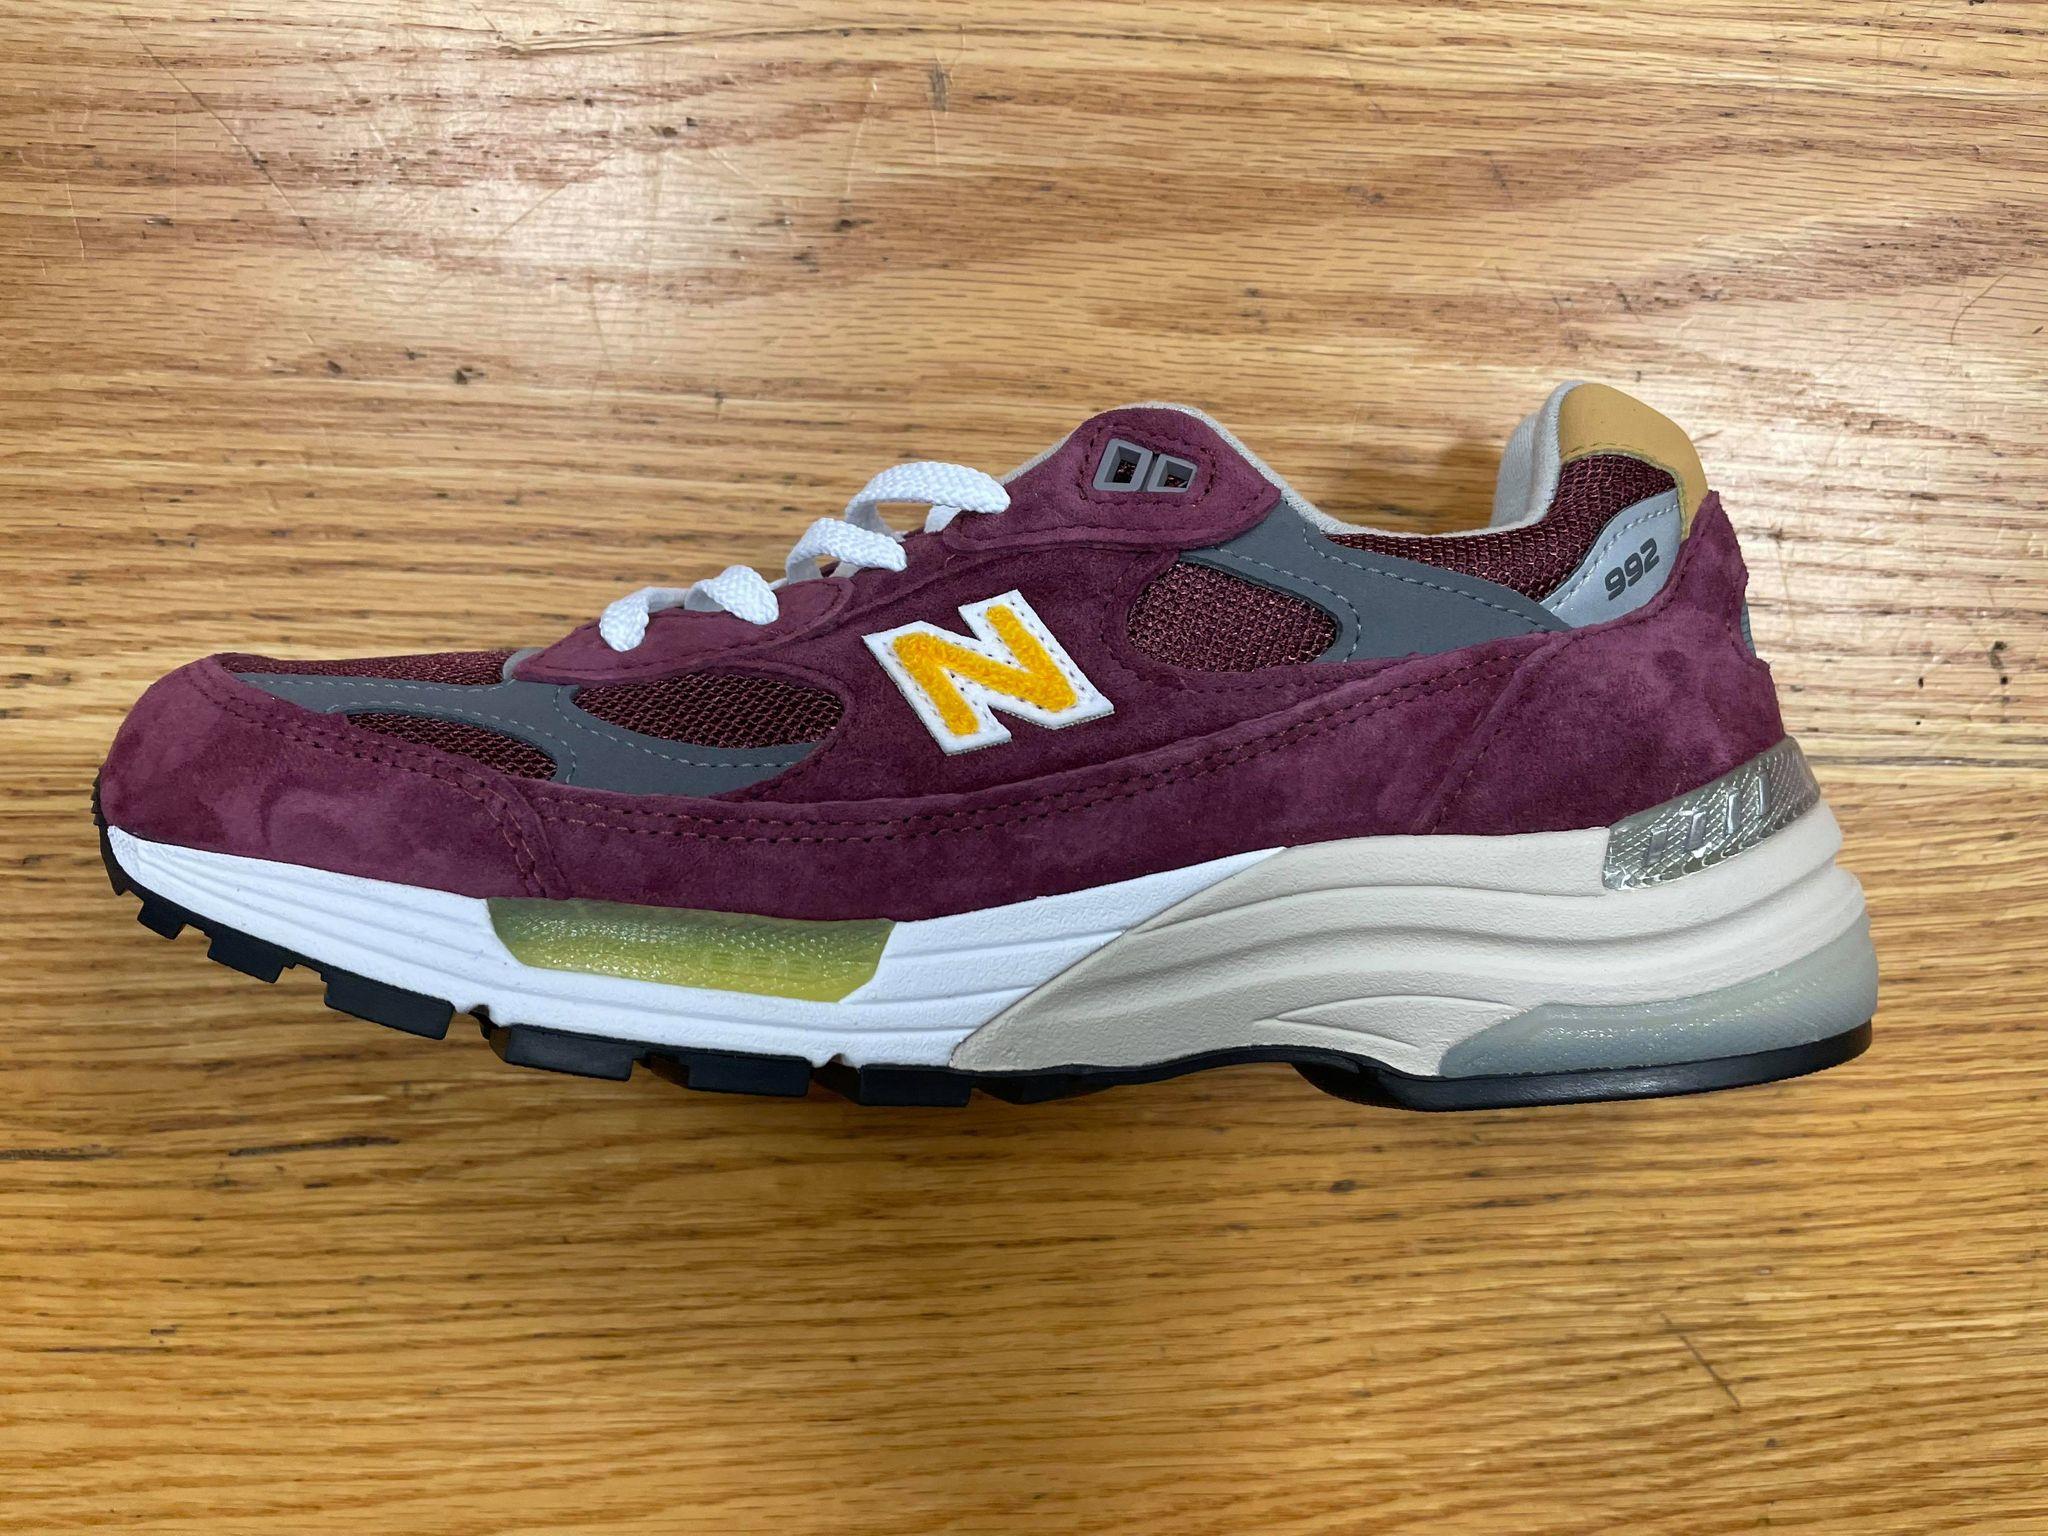 New Balance 992 NB992 Burgundy & Gold M992CA